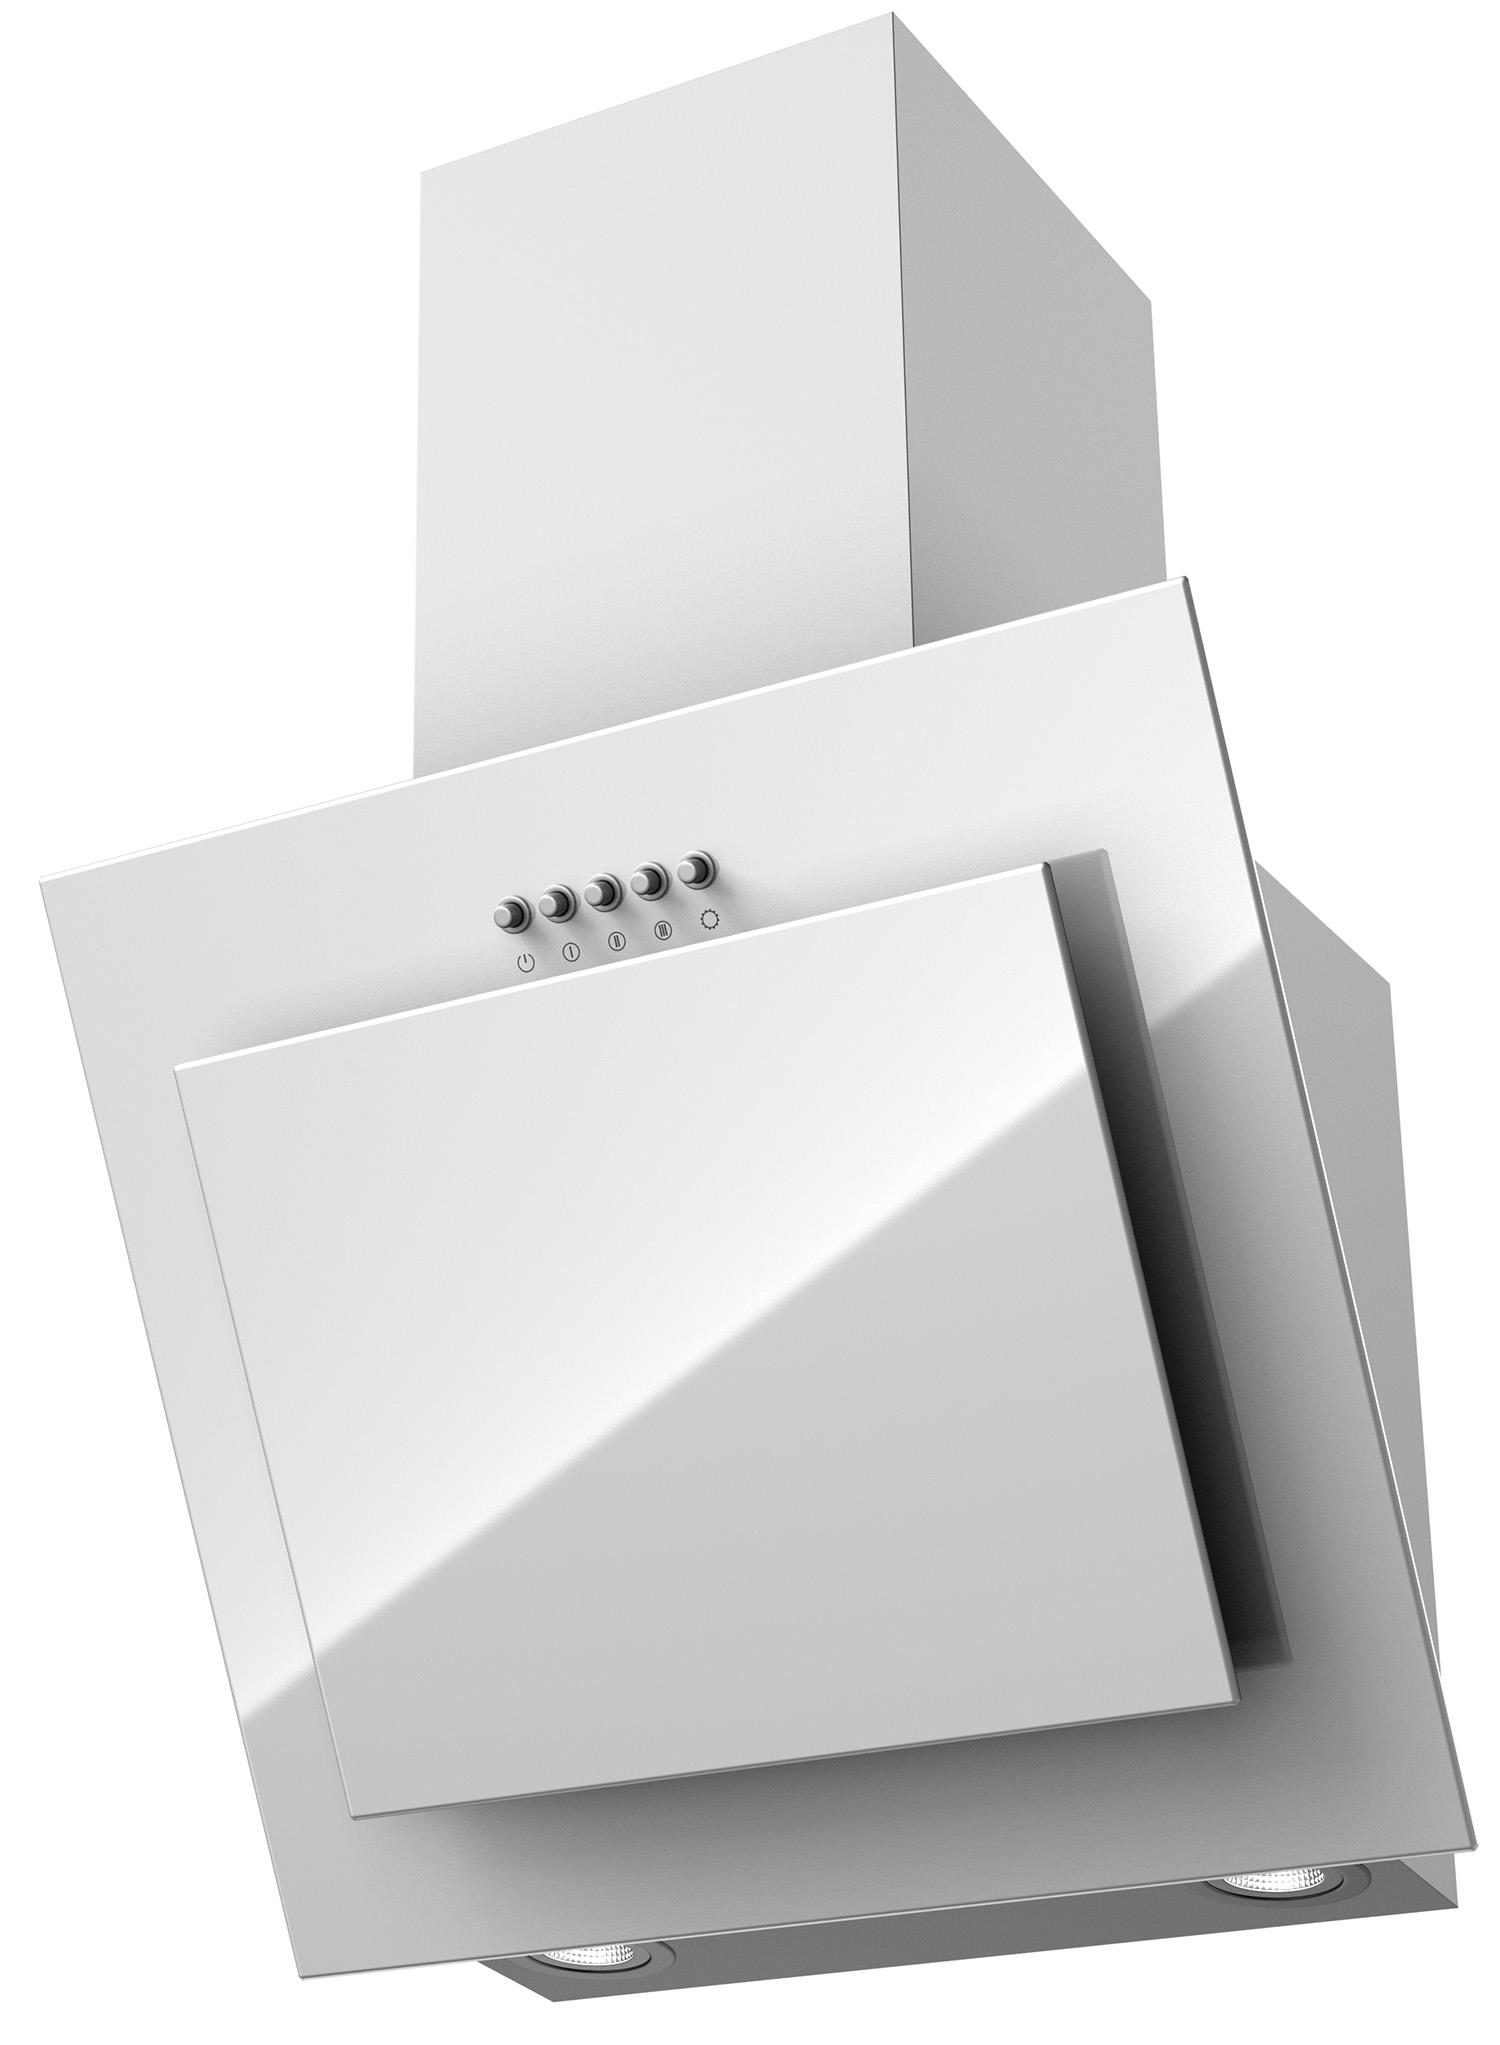 SELIYA 500 white push button, стоимость 13 104 руб.